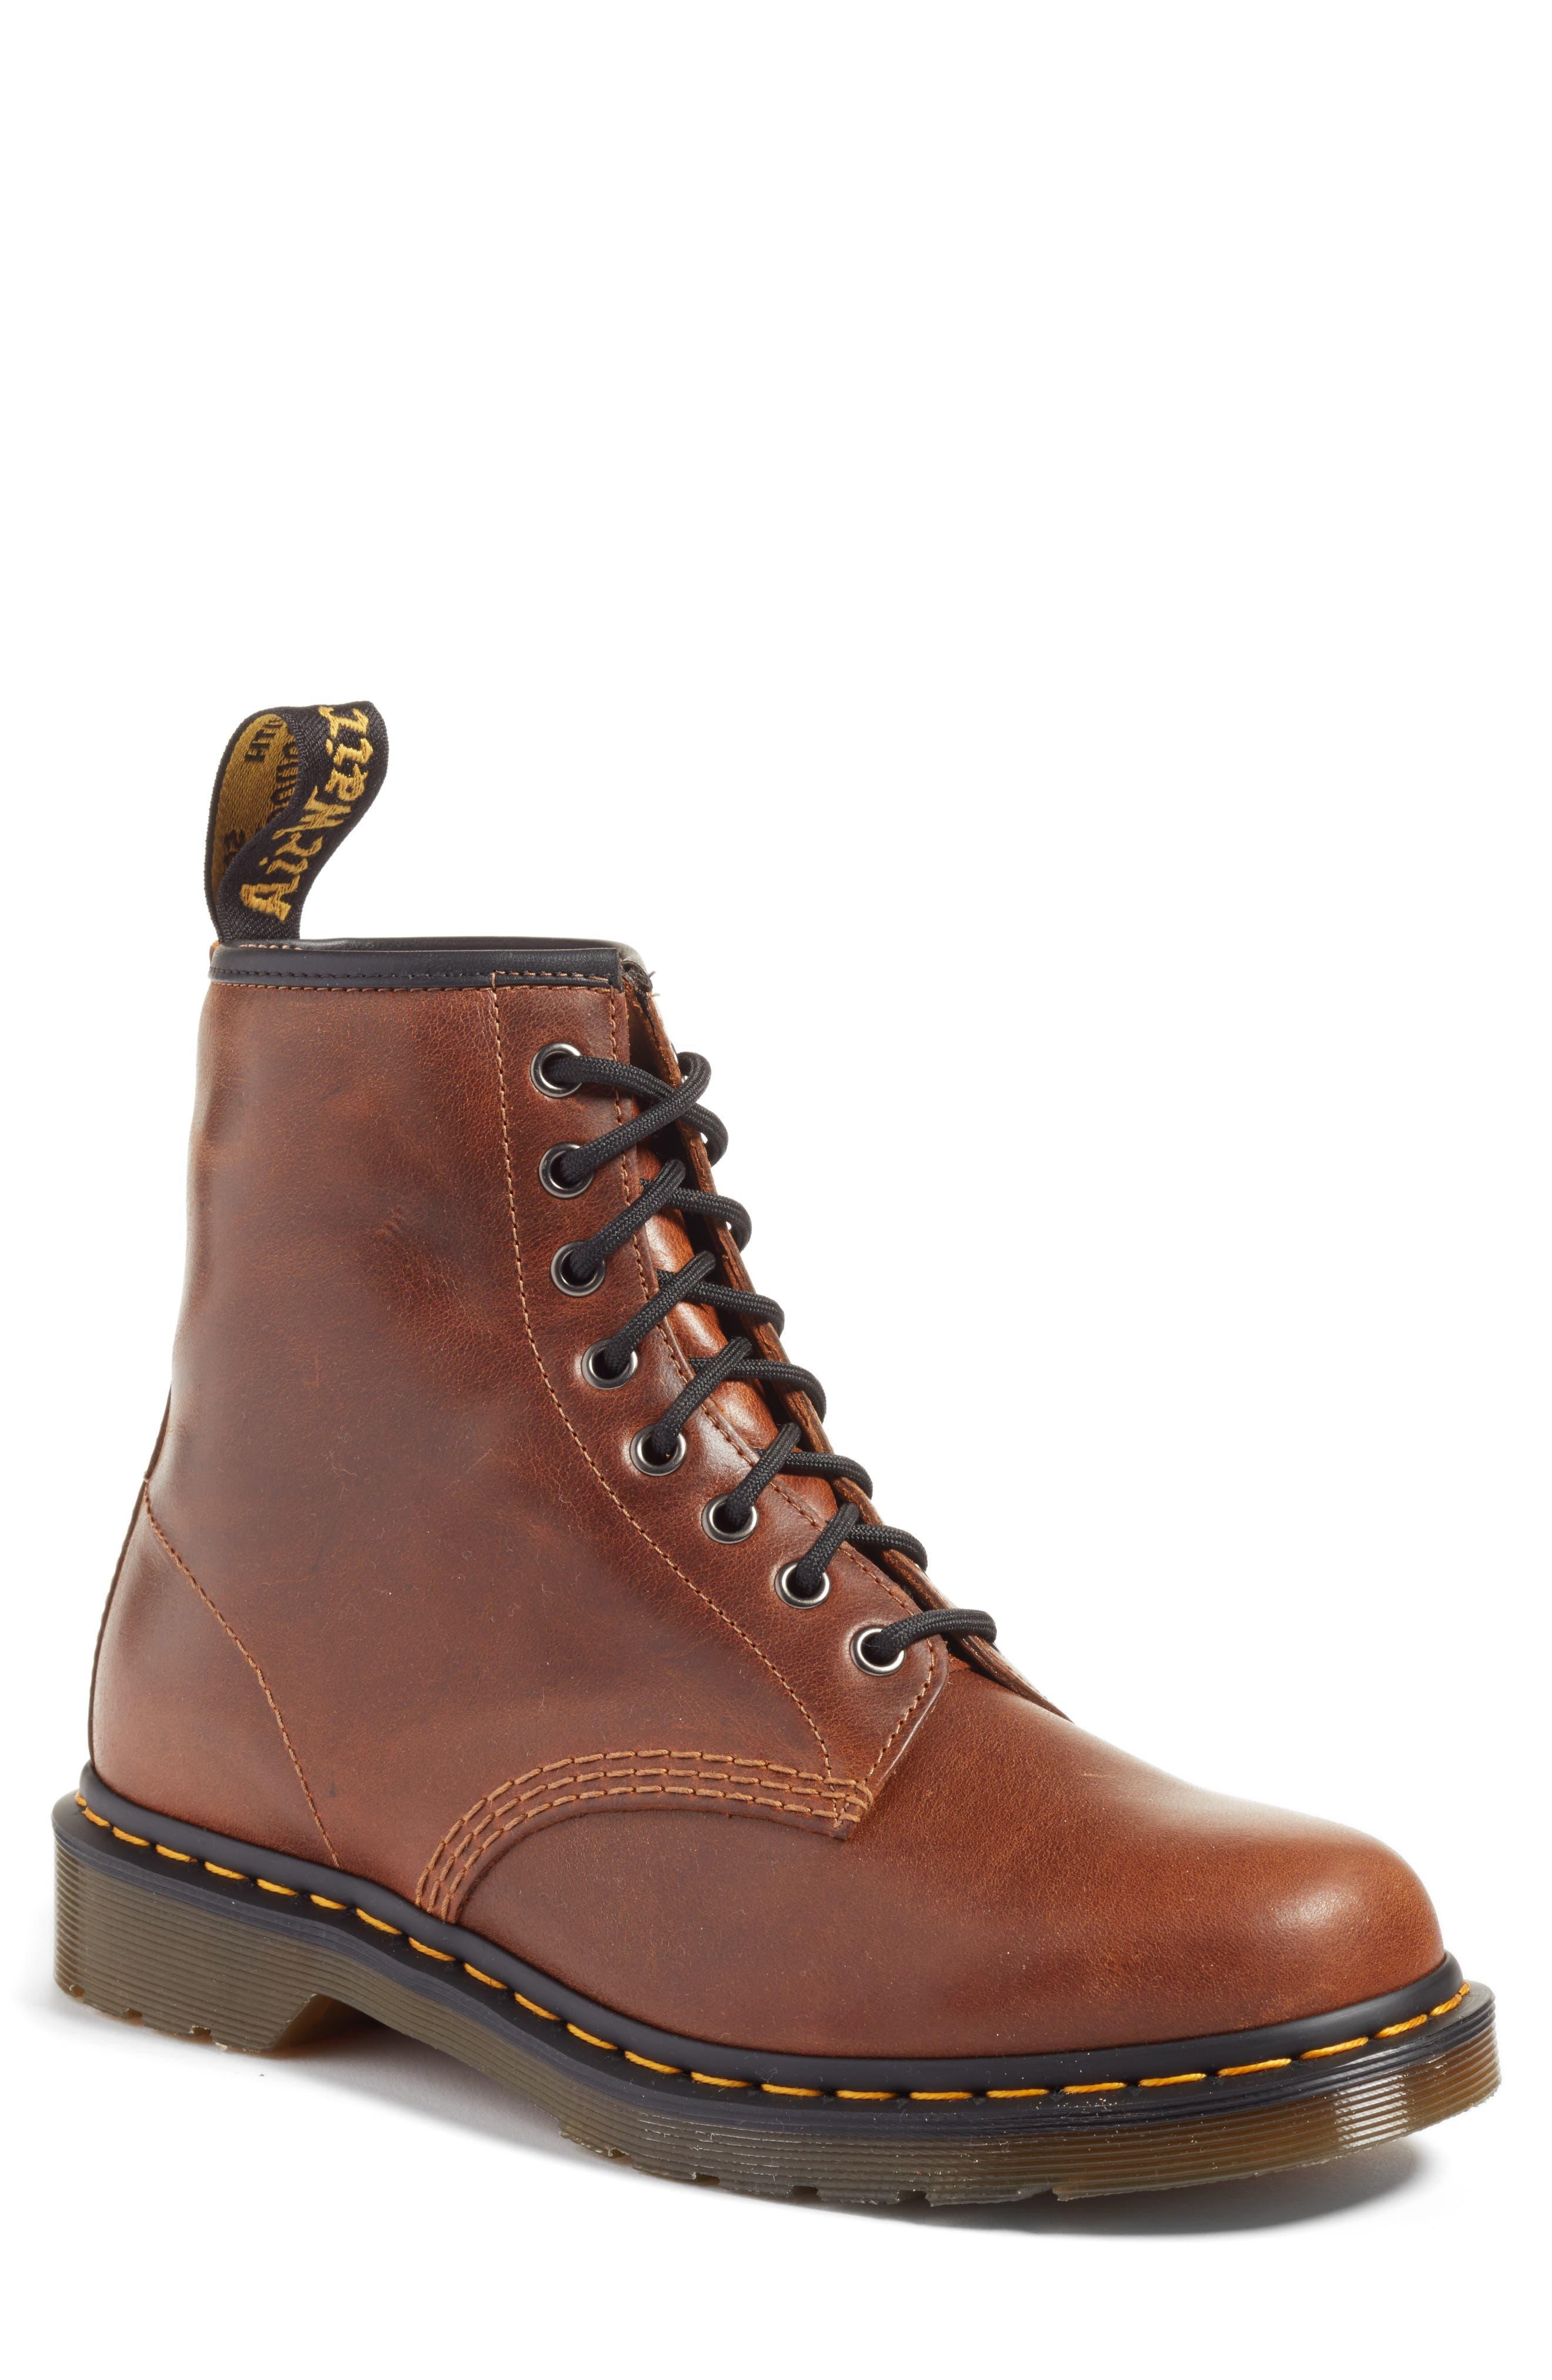 Alternate Image 1 Selected - Dr. Martens 1460 8-Eye Boot (Men)